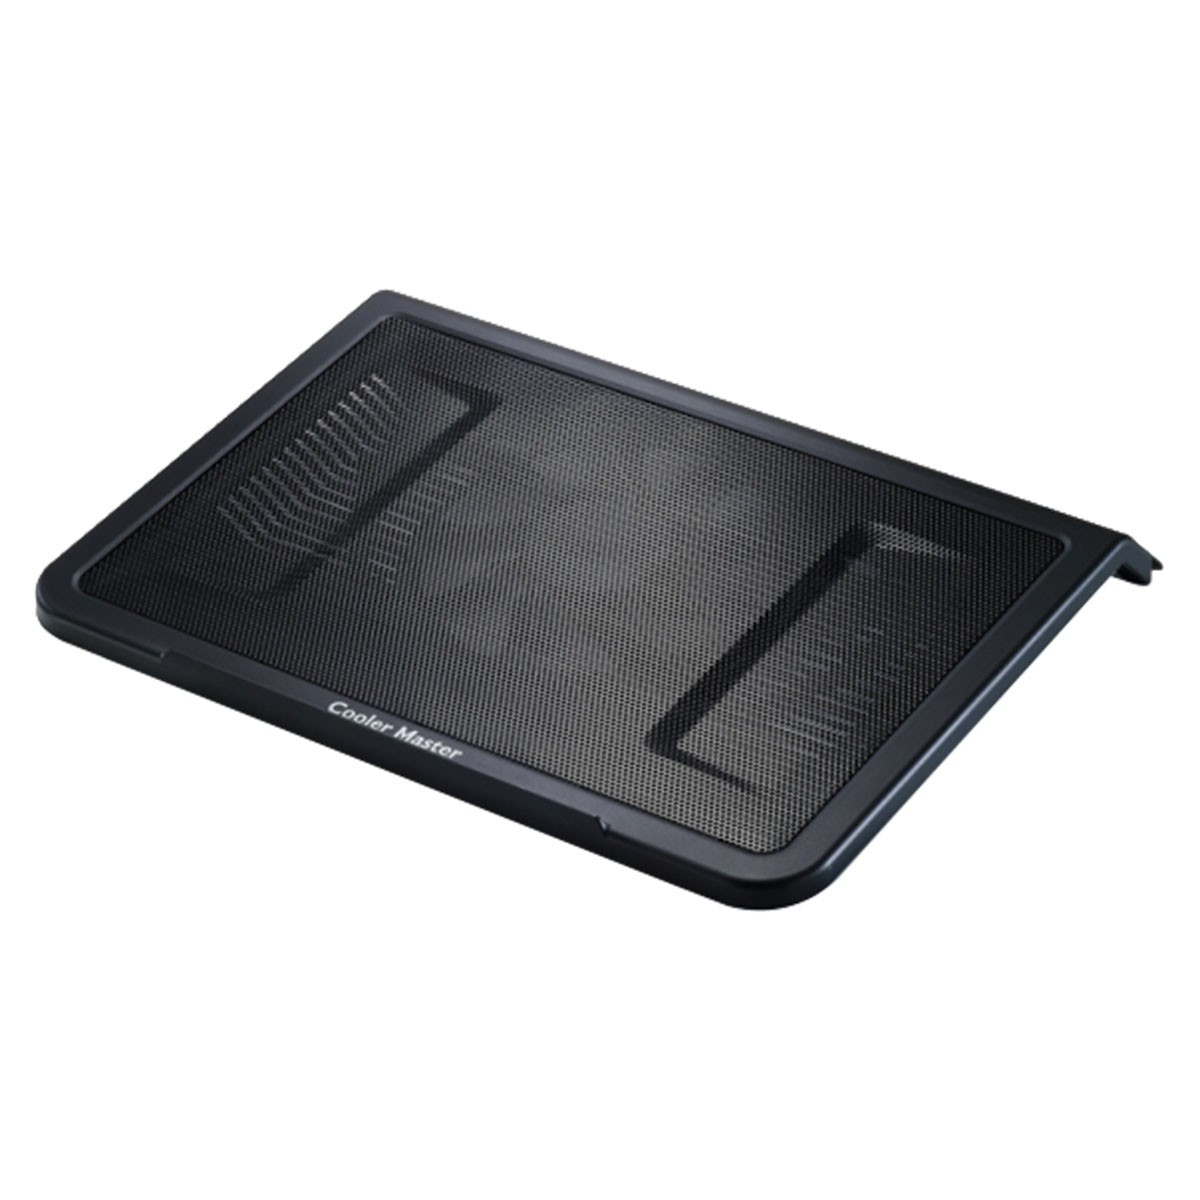 Base para Notebook L1 Preta - 1 FAN 160MM - L1 R9-NBC-NPL1-GP